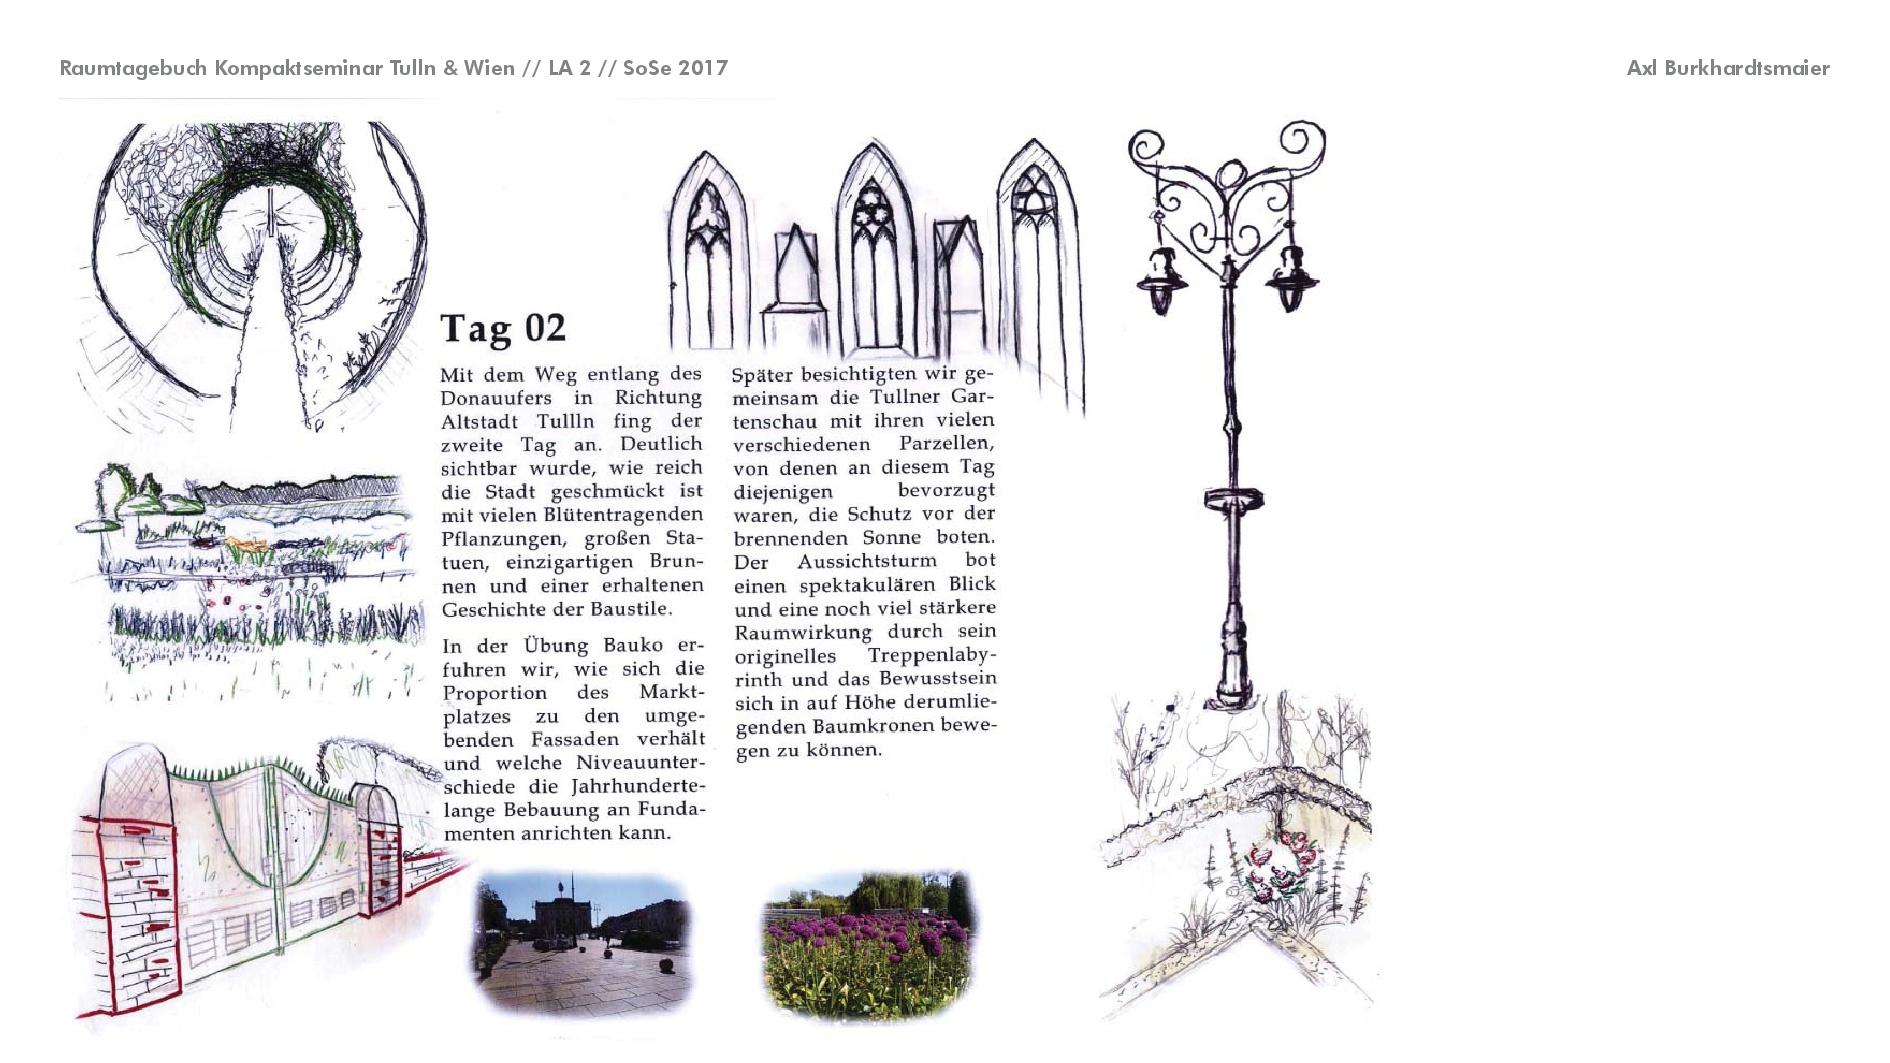 NEU Screen Raumtagebuch Tulln Wien SoSe 17 043